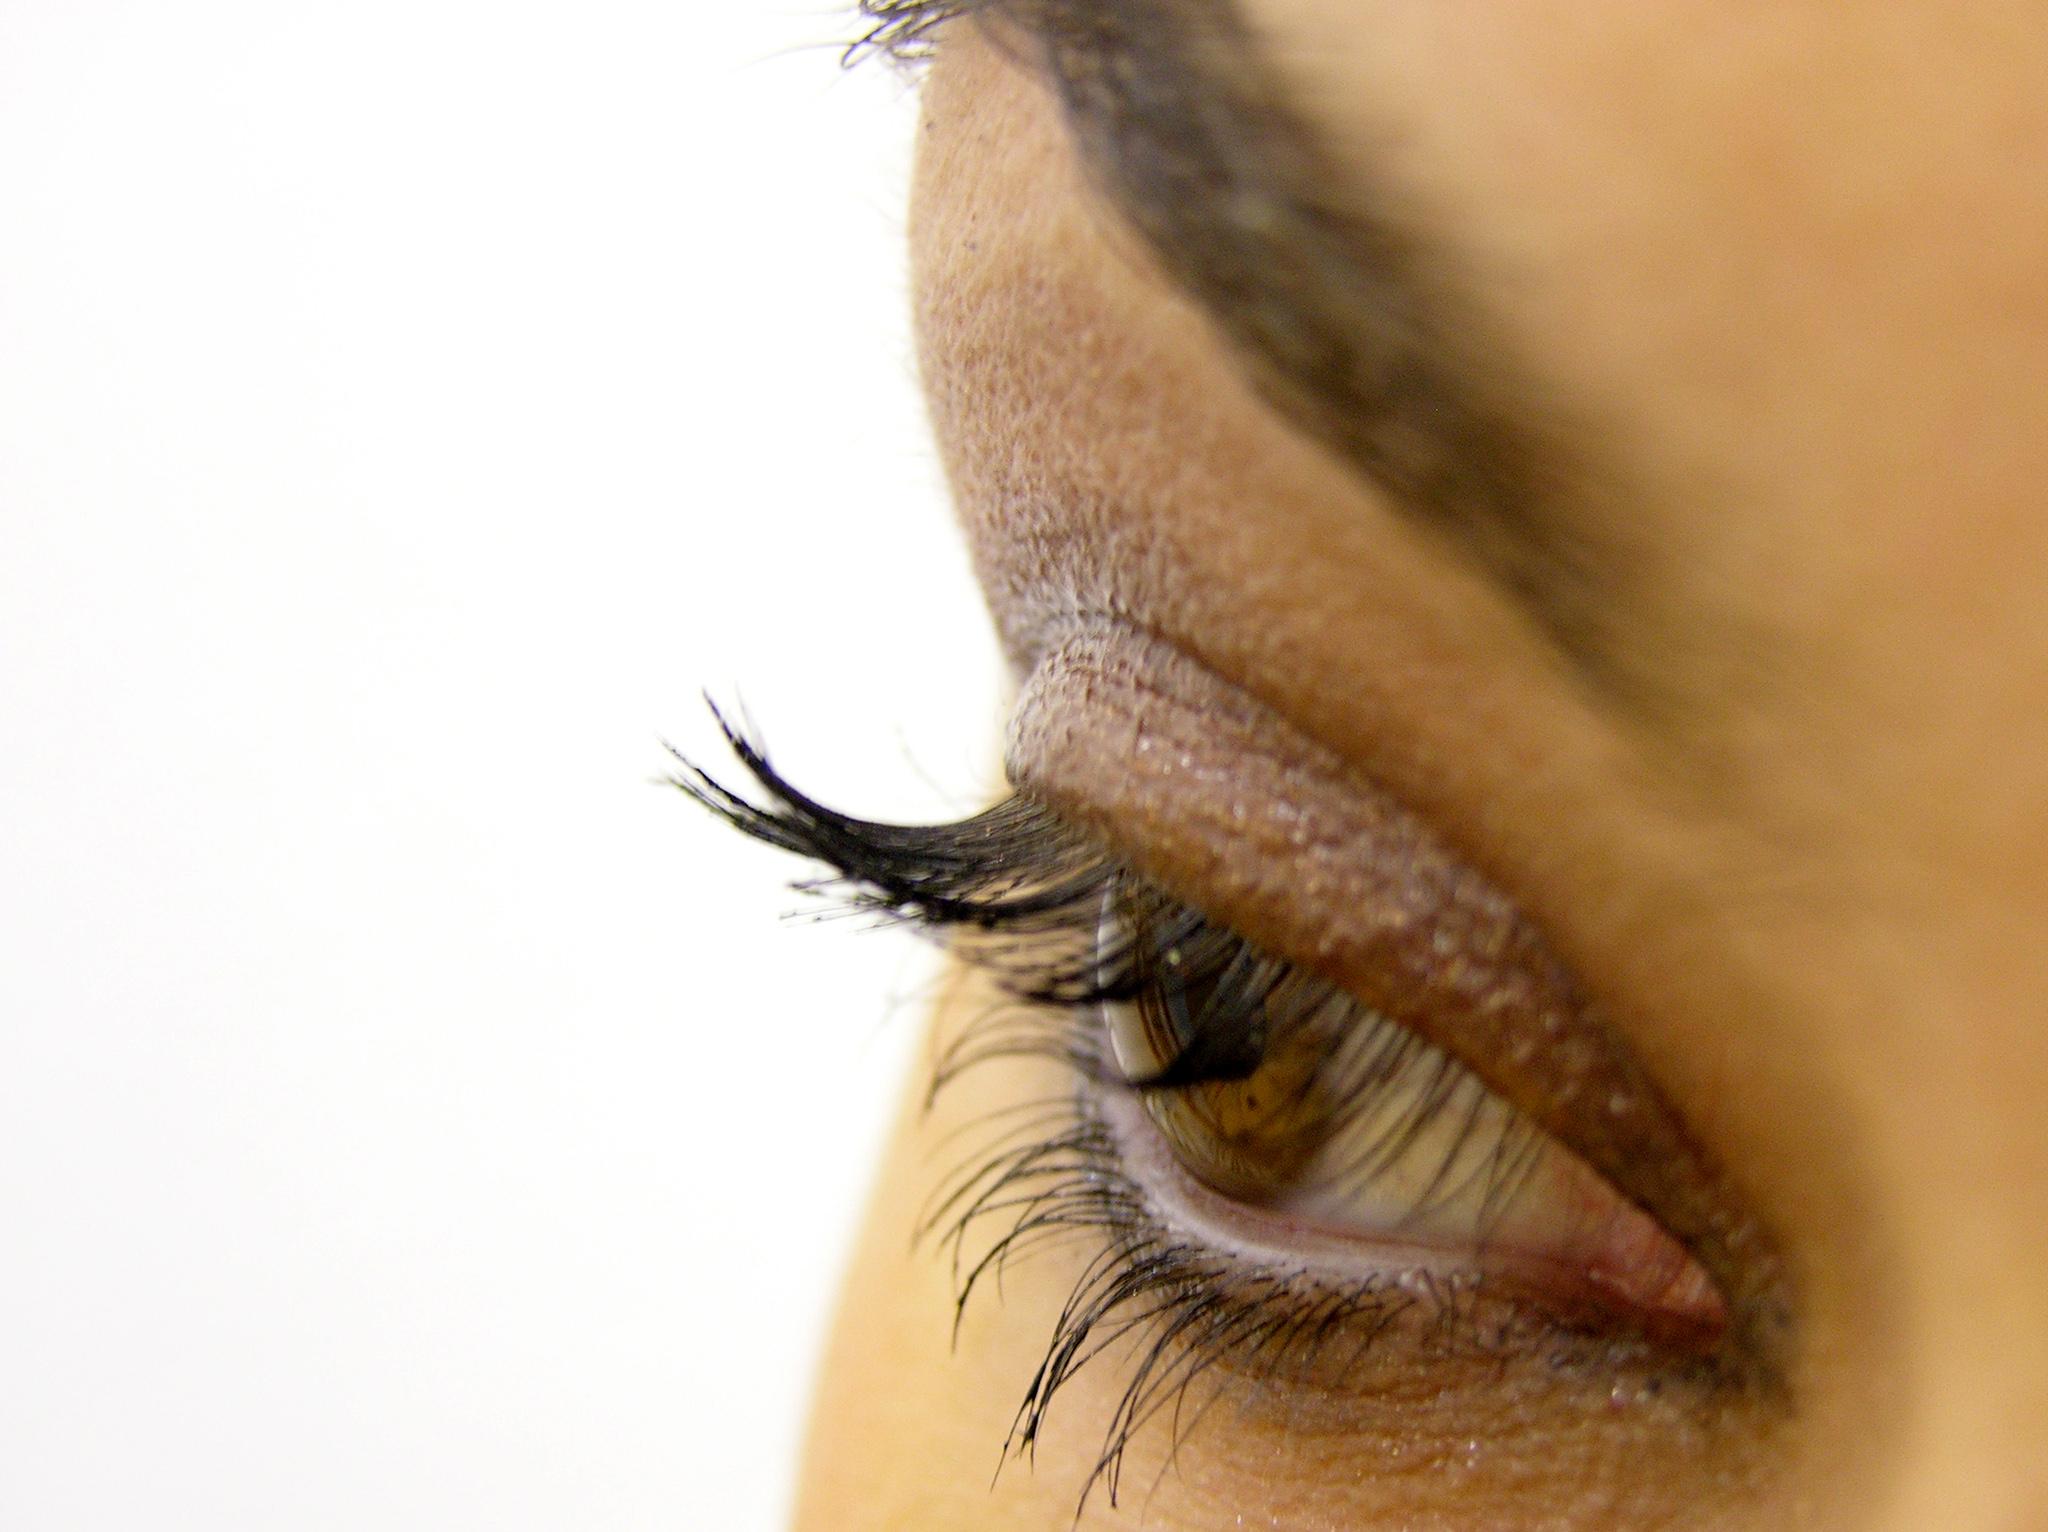 Eyelid - Wikipedia